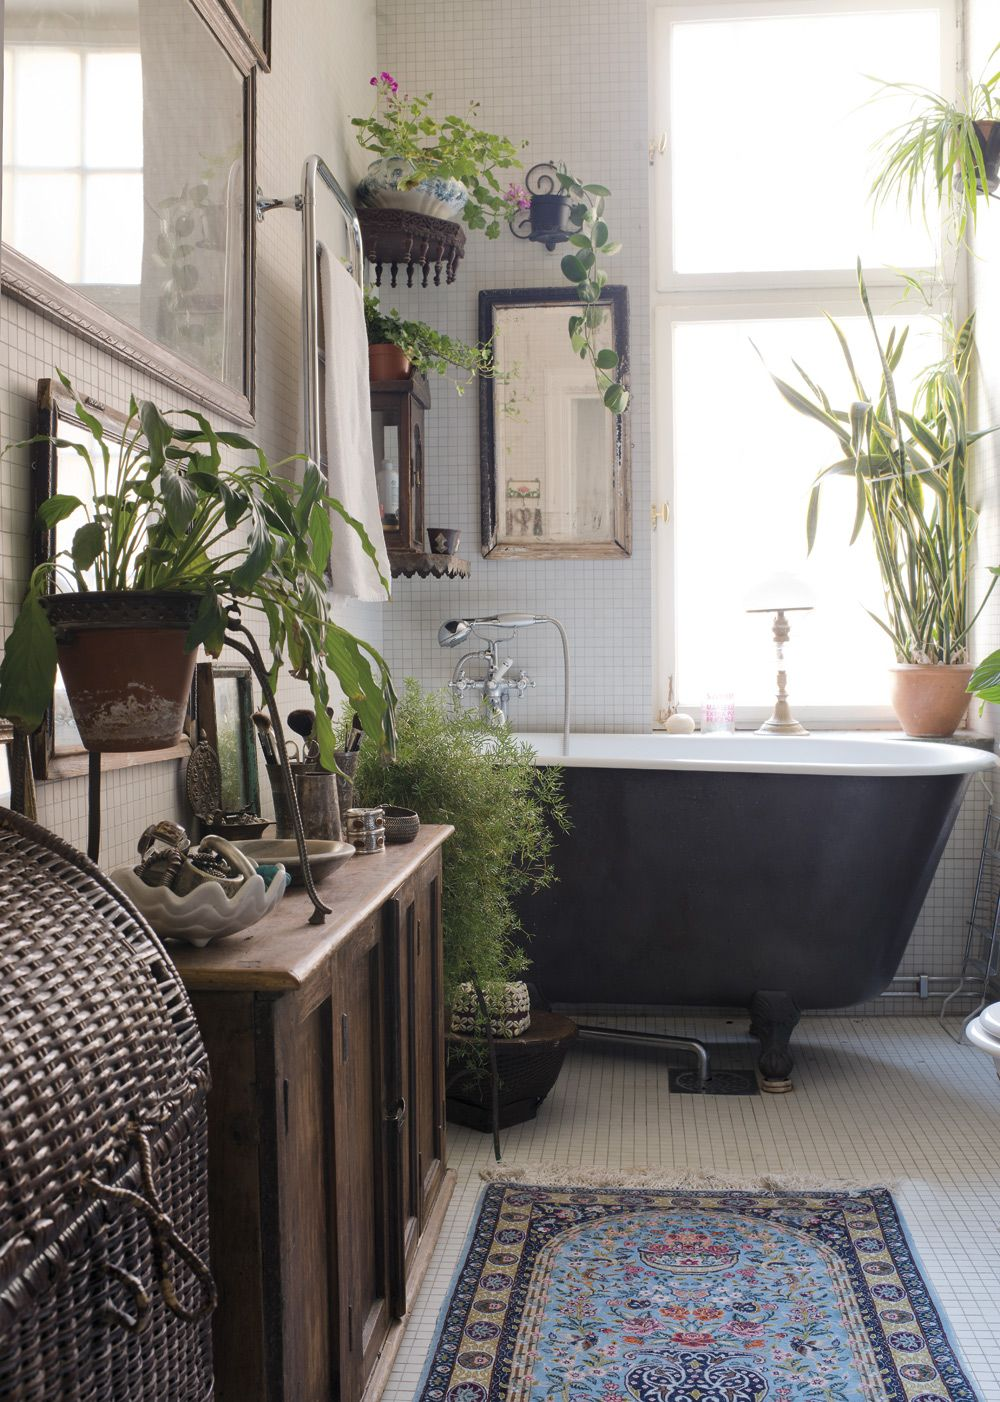 Magasin Salle De Bain Muret ~ badrummet ett frist ende badkar p tassar fr n magasin 13 s tter